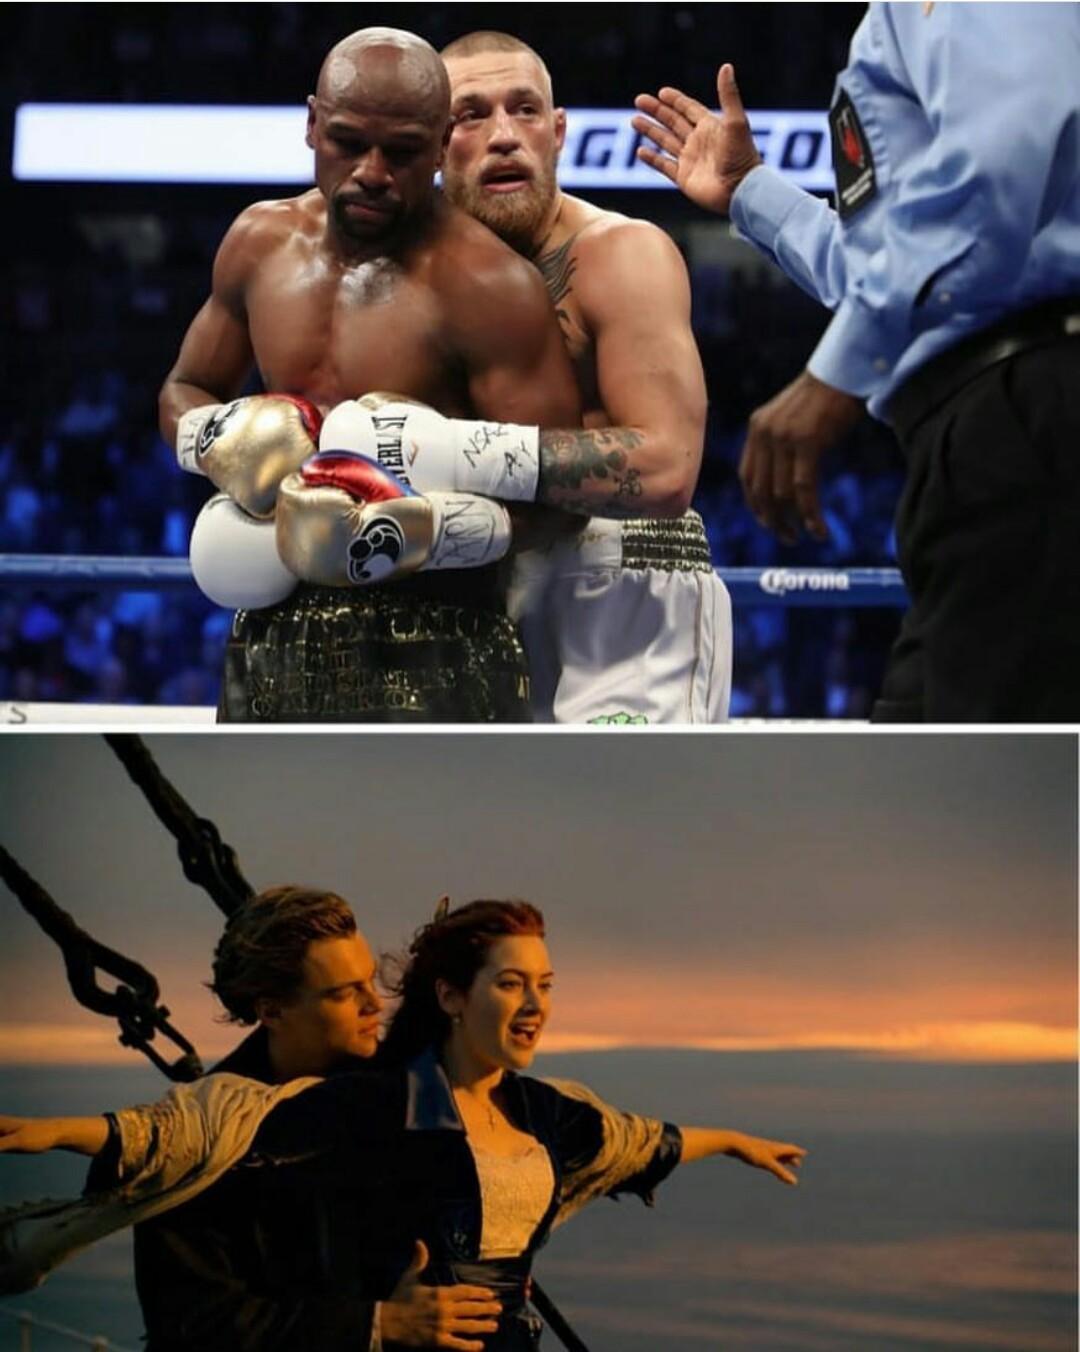 Je vole McGregor... - meme